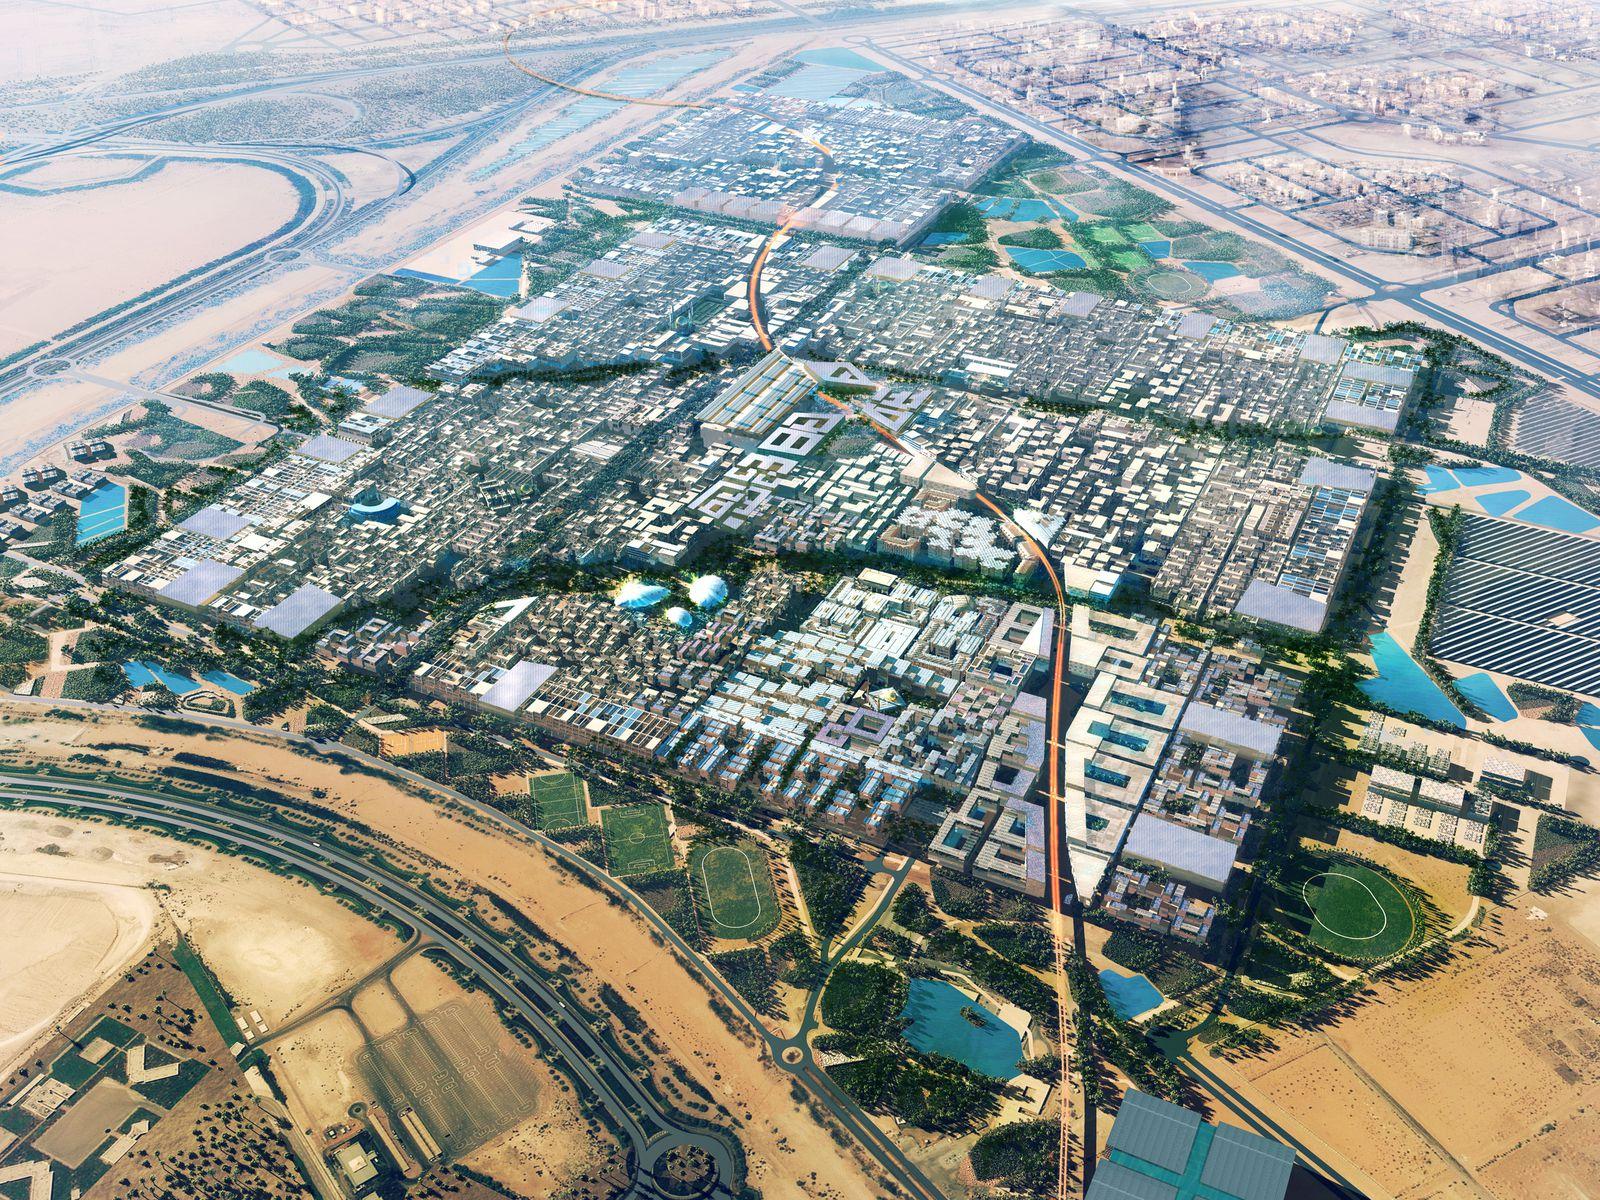 Overlay of the Masdar City